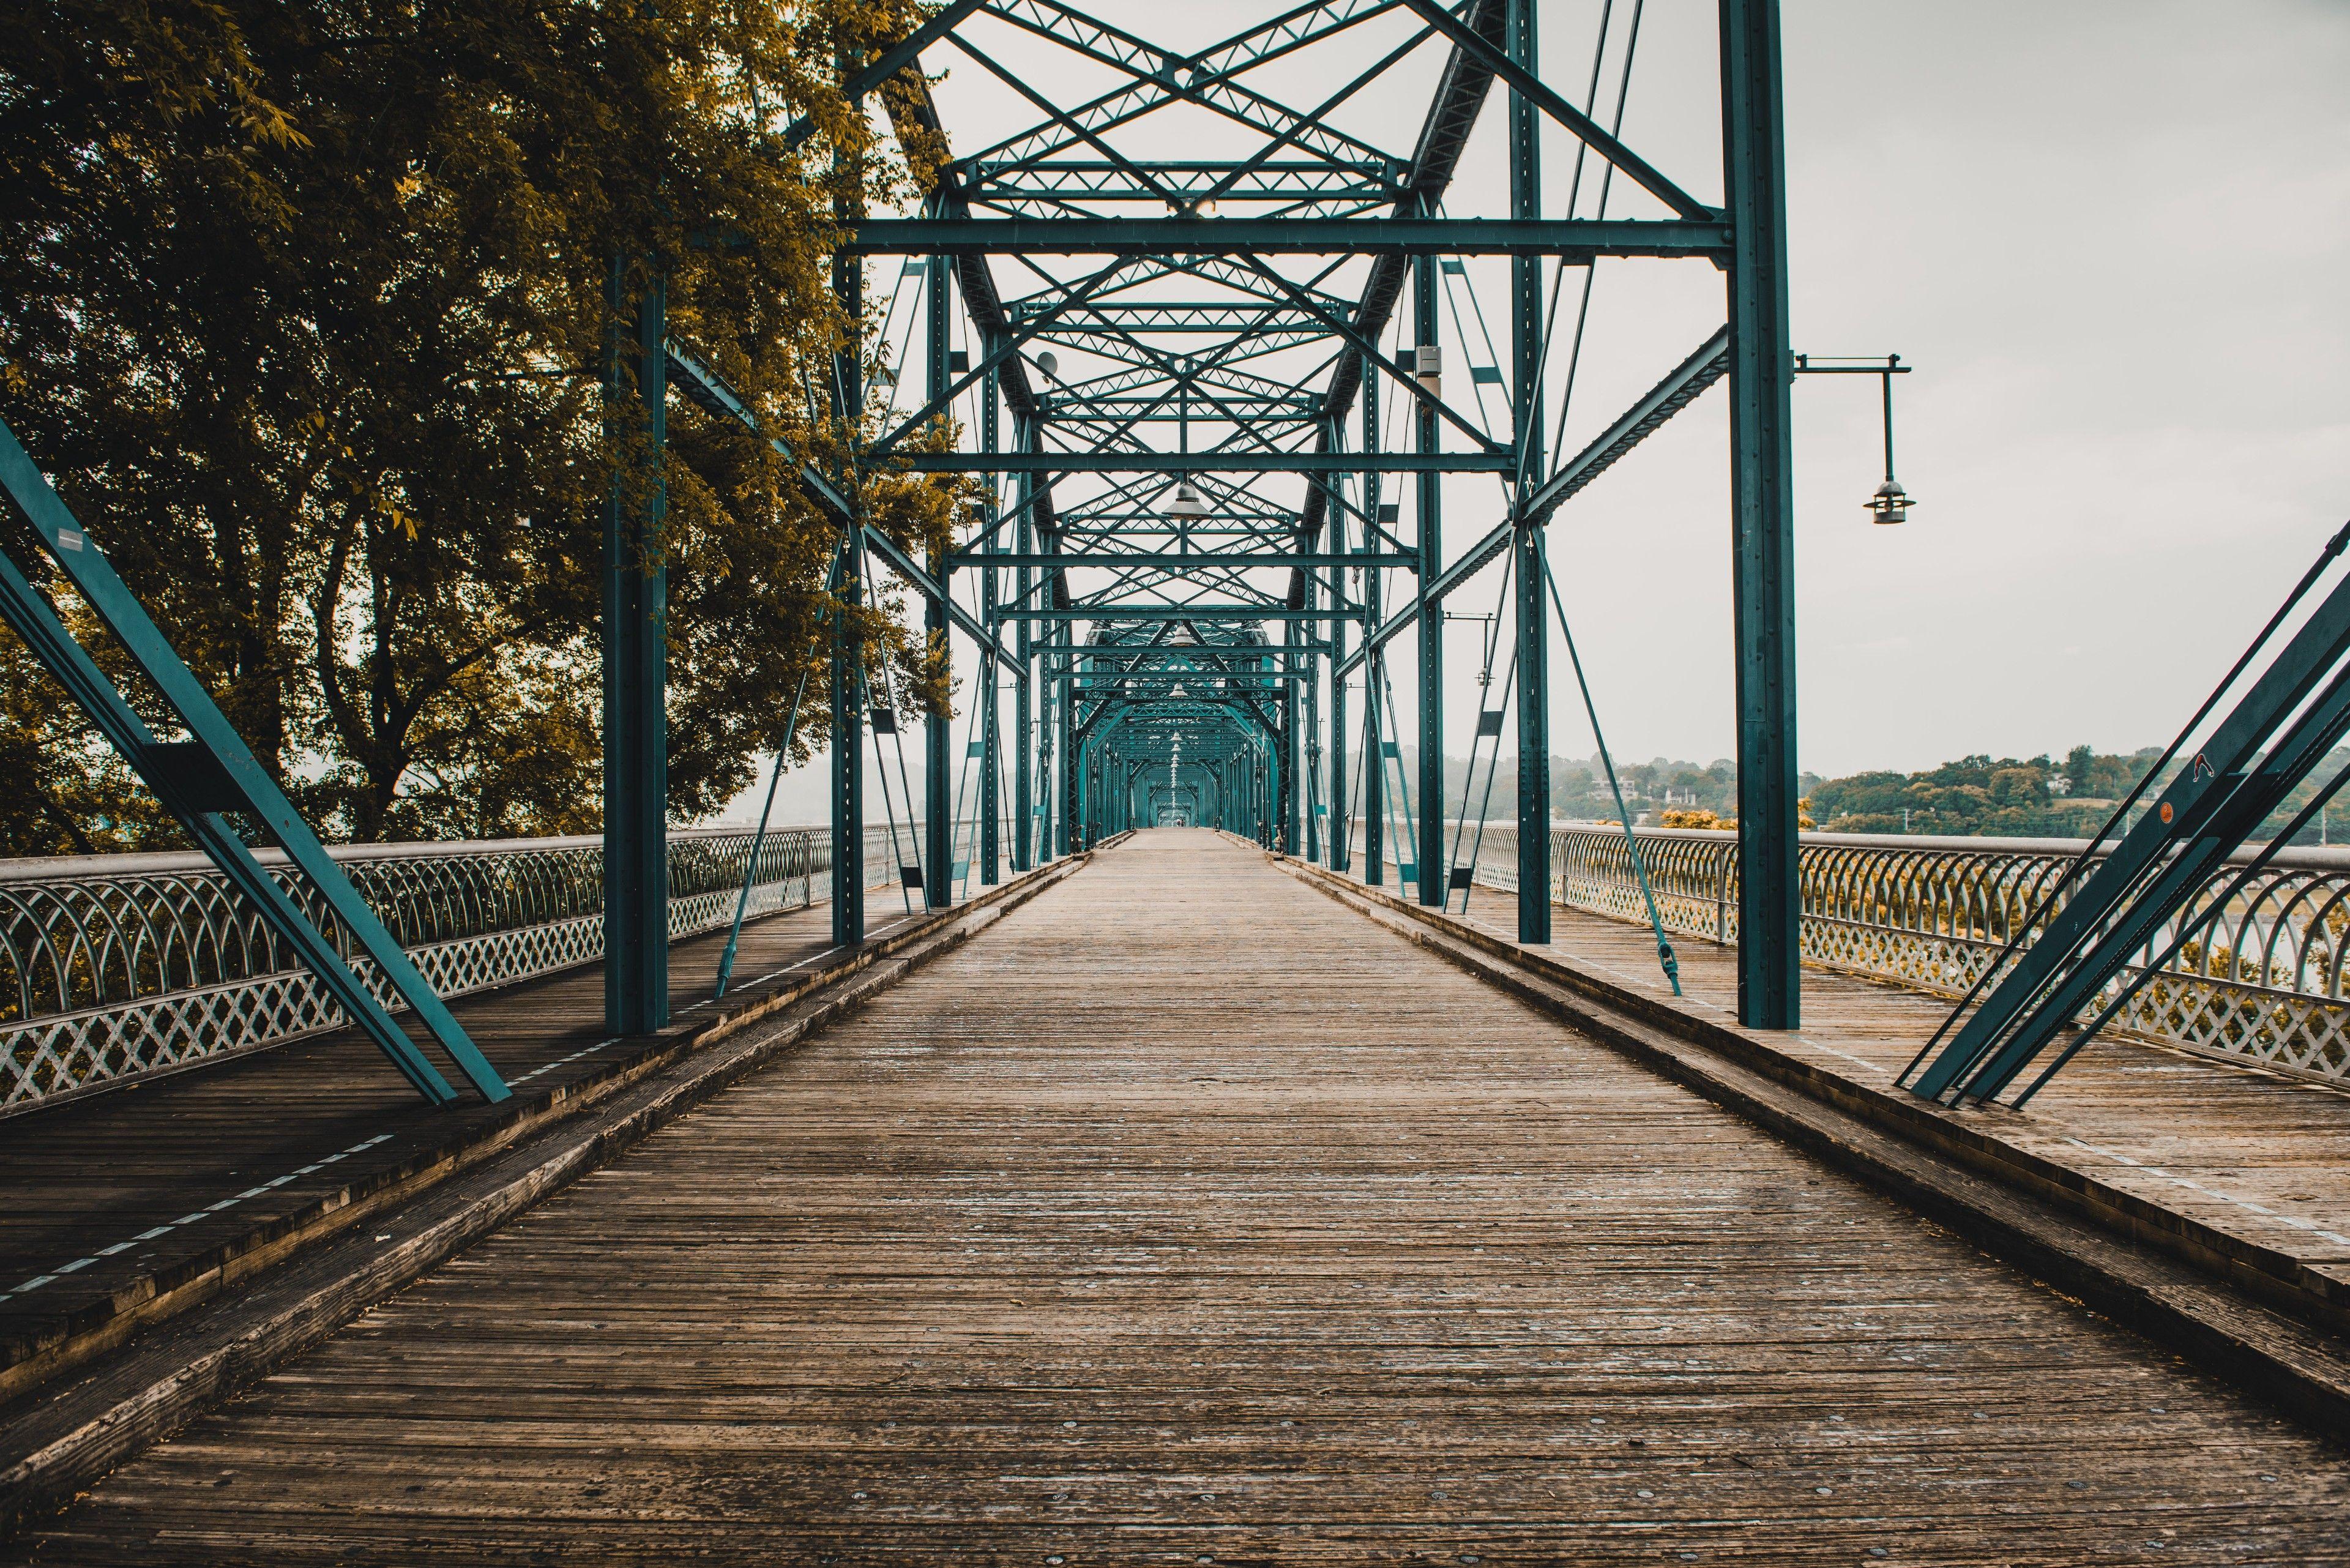 Landscape shot of the Chattanooga Cherry Street Walking Bridge